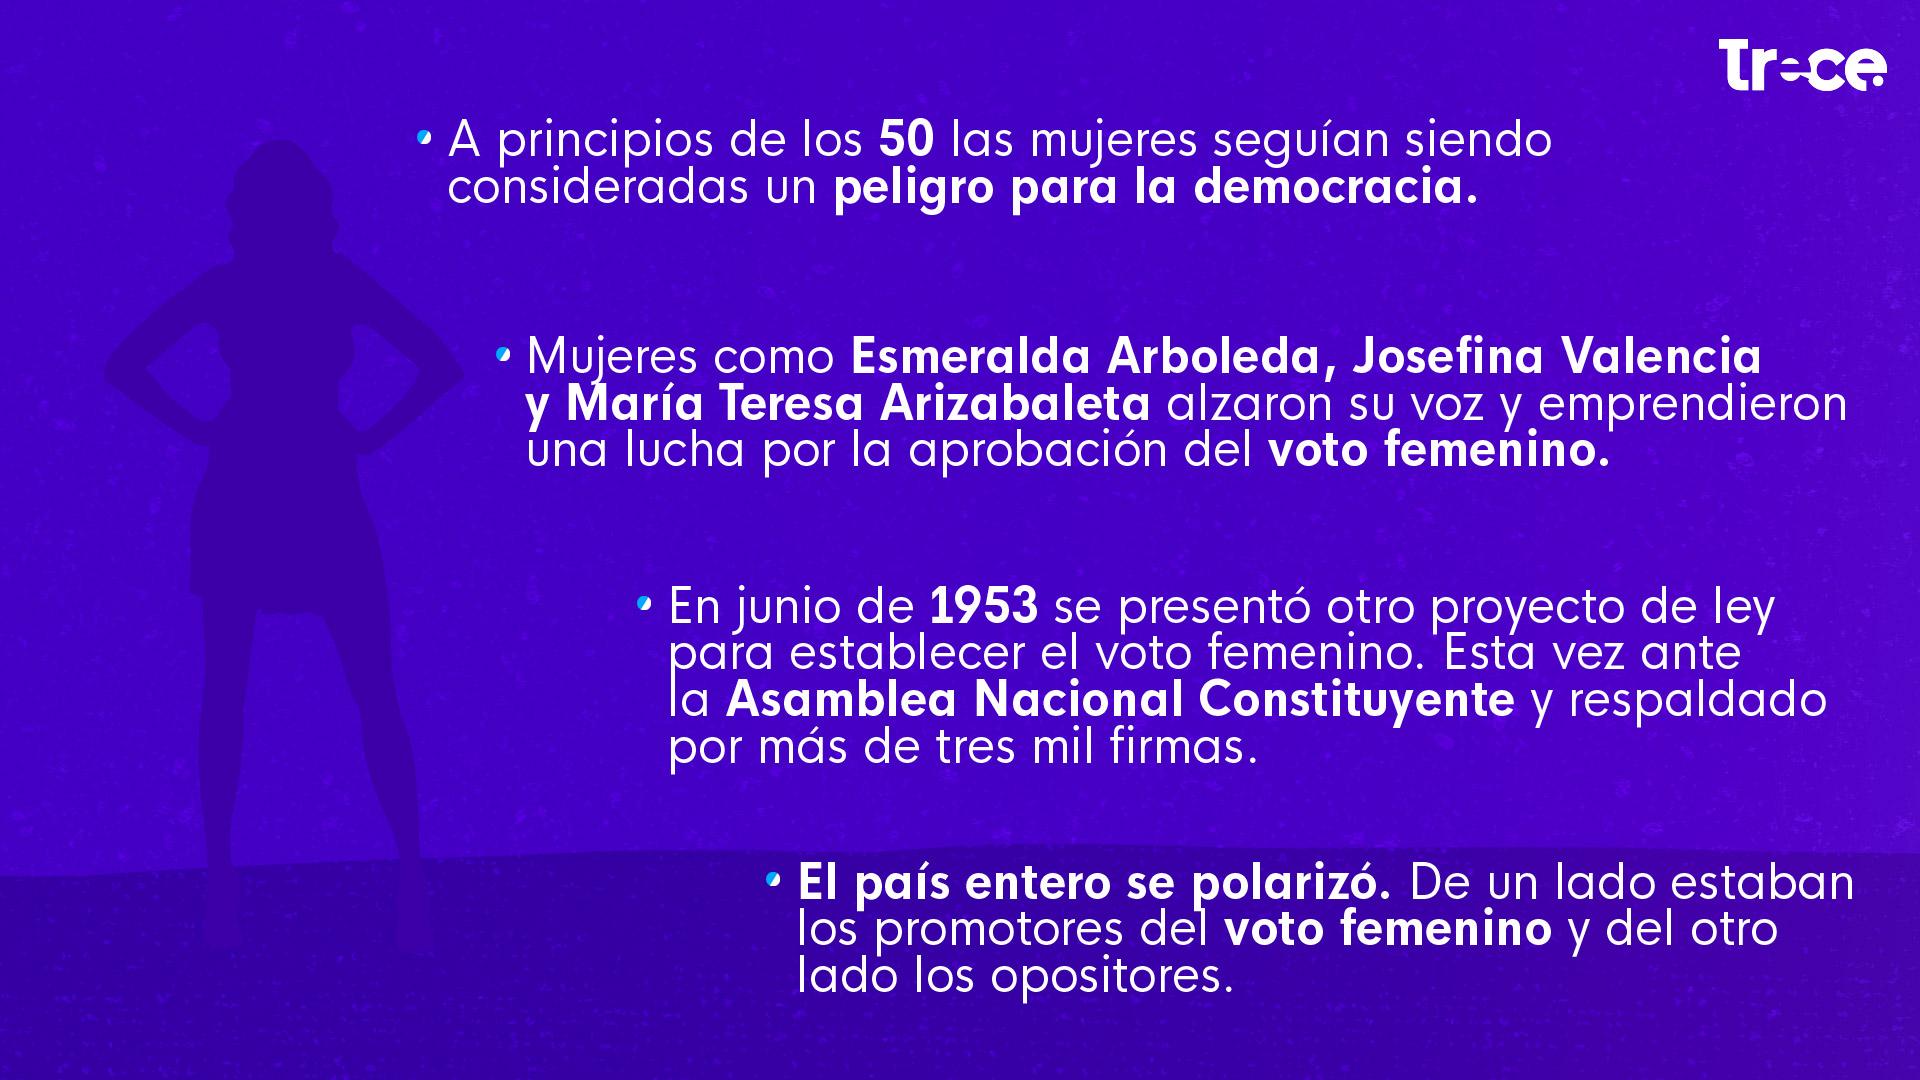 Voto Femenino 61 Anos En Colombia